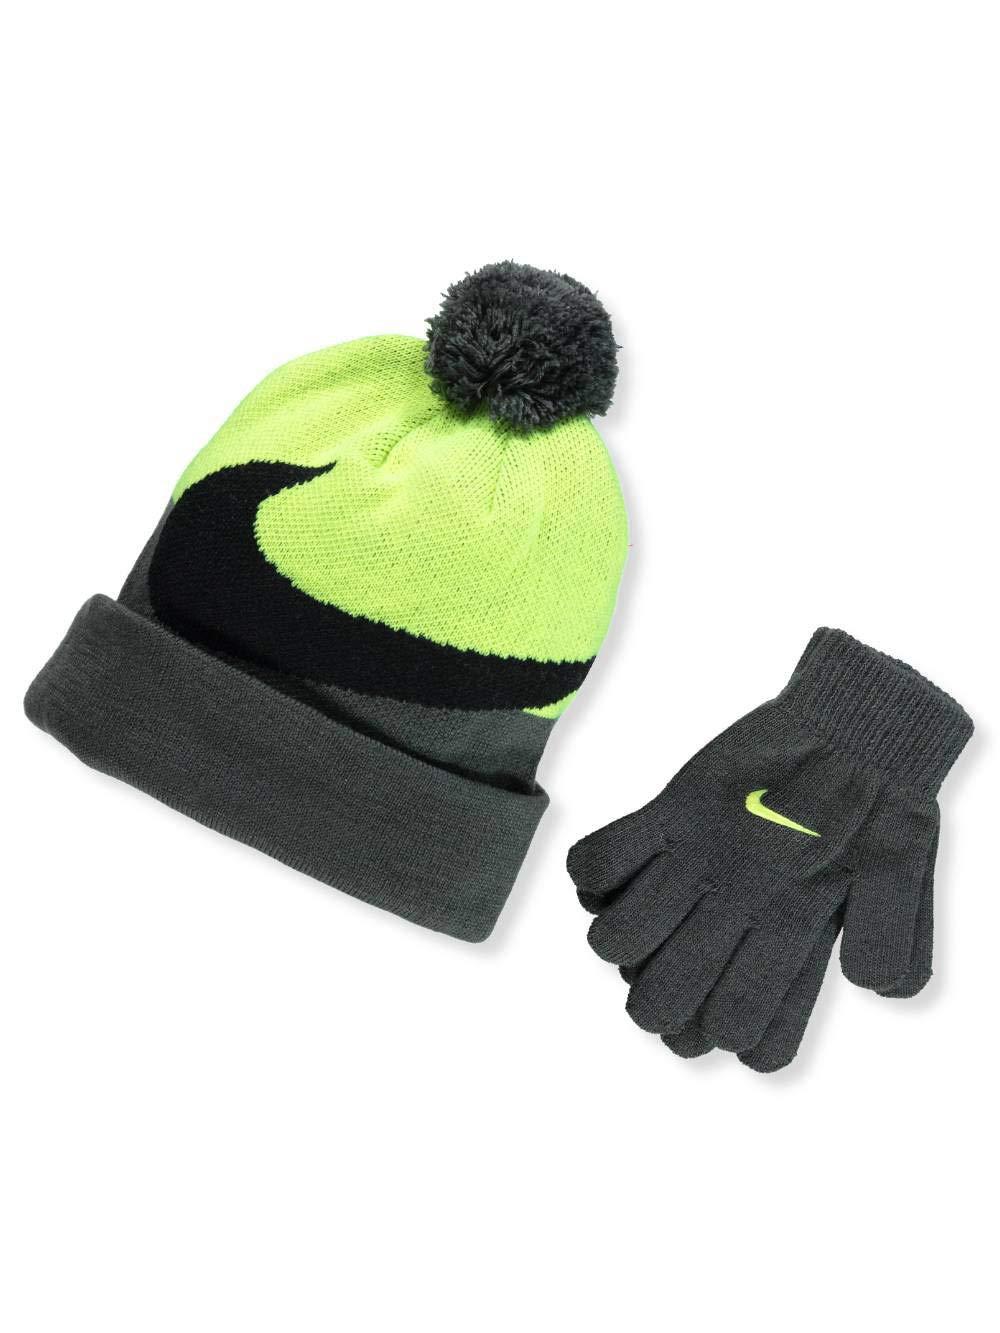 Nike Knit Beanie & Gloves Set